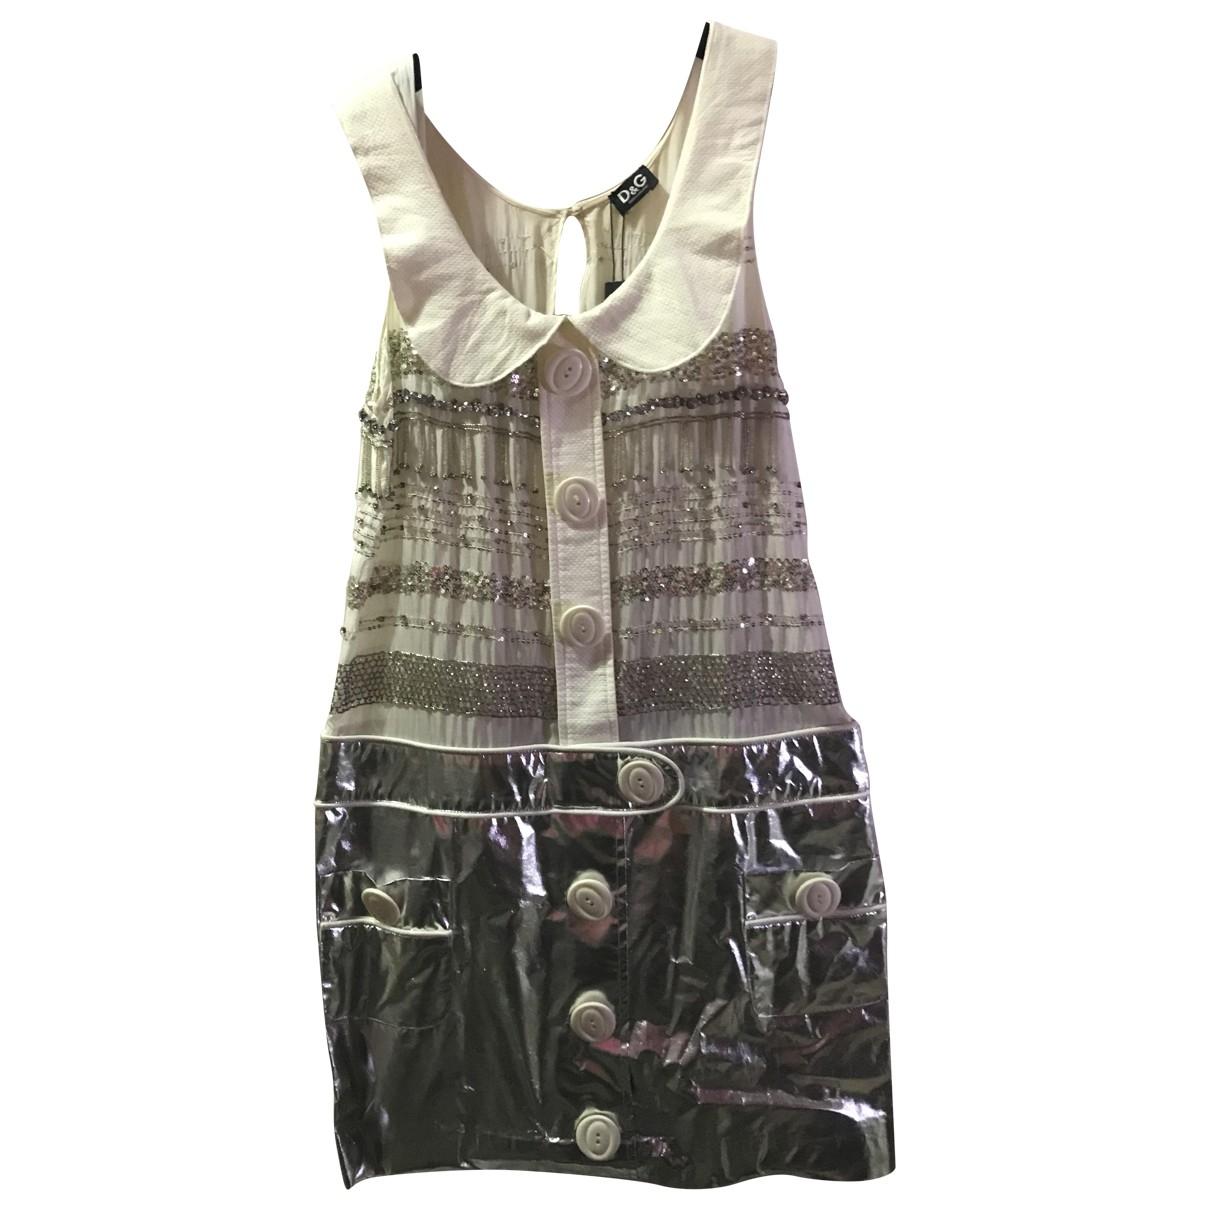 D&g \N Metallic Cotton dress for Women 42 IT